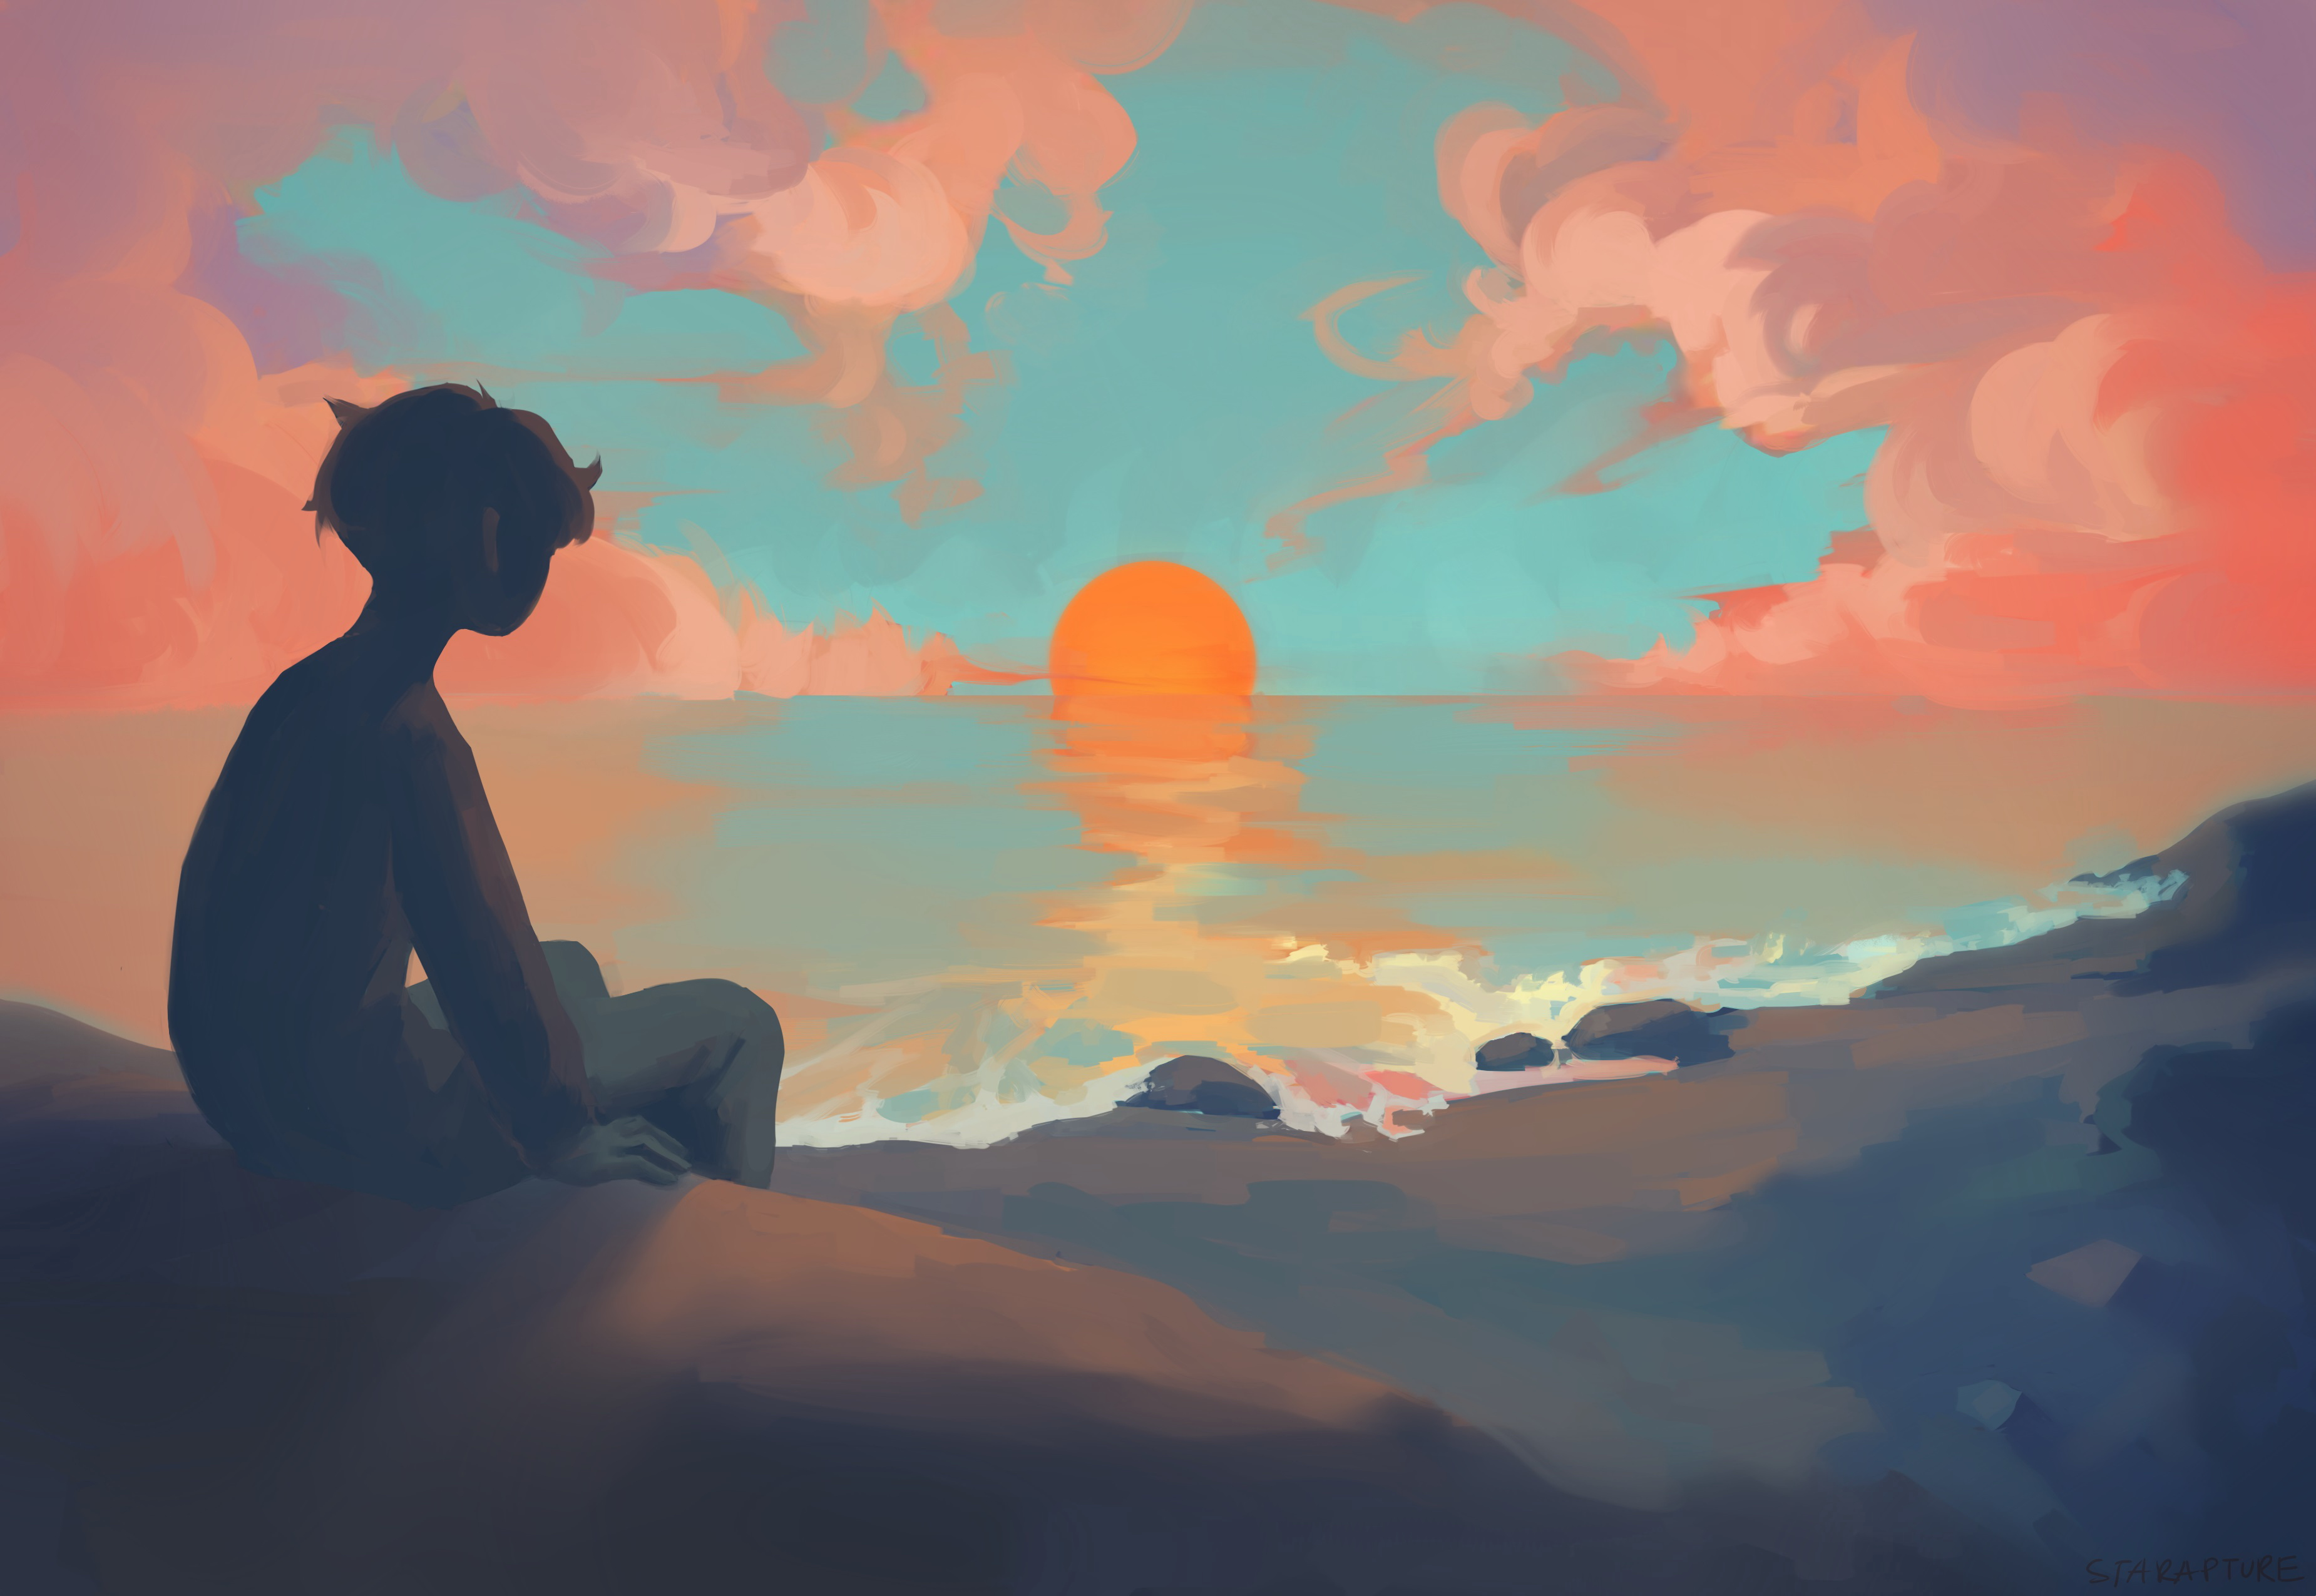 Anime Boy Sitting Watching Sunset, HD Anime, 4k Wallpapers ...